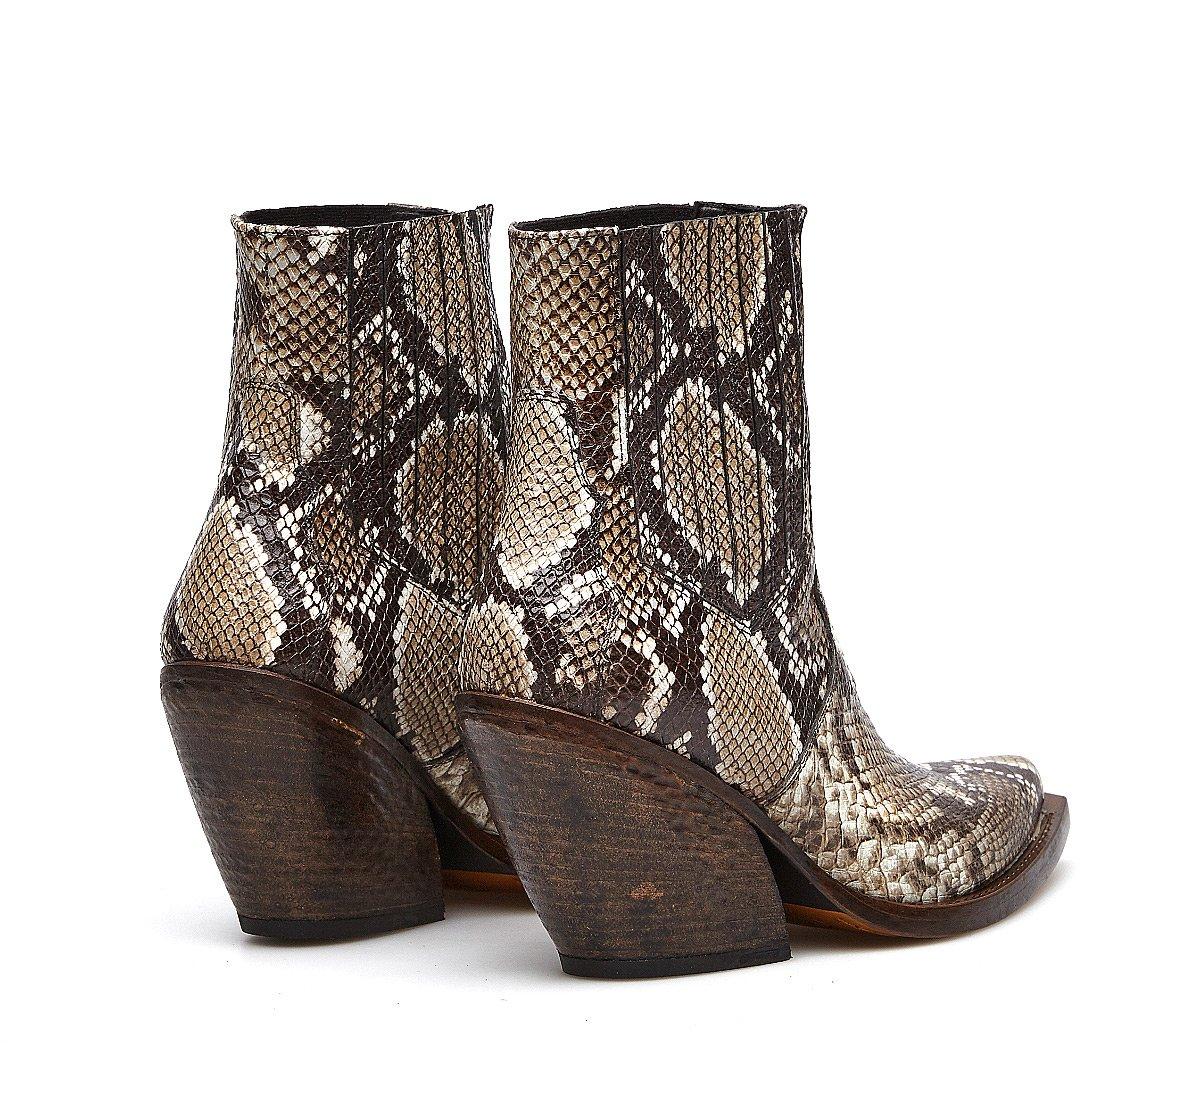 Barracuda cowboy boots in exquisite calfskin